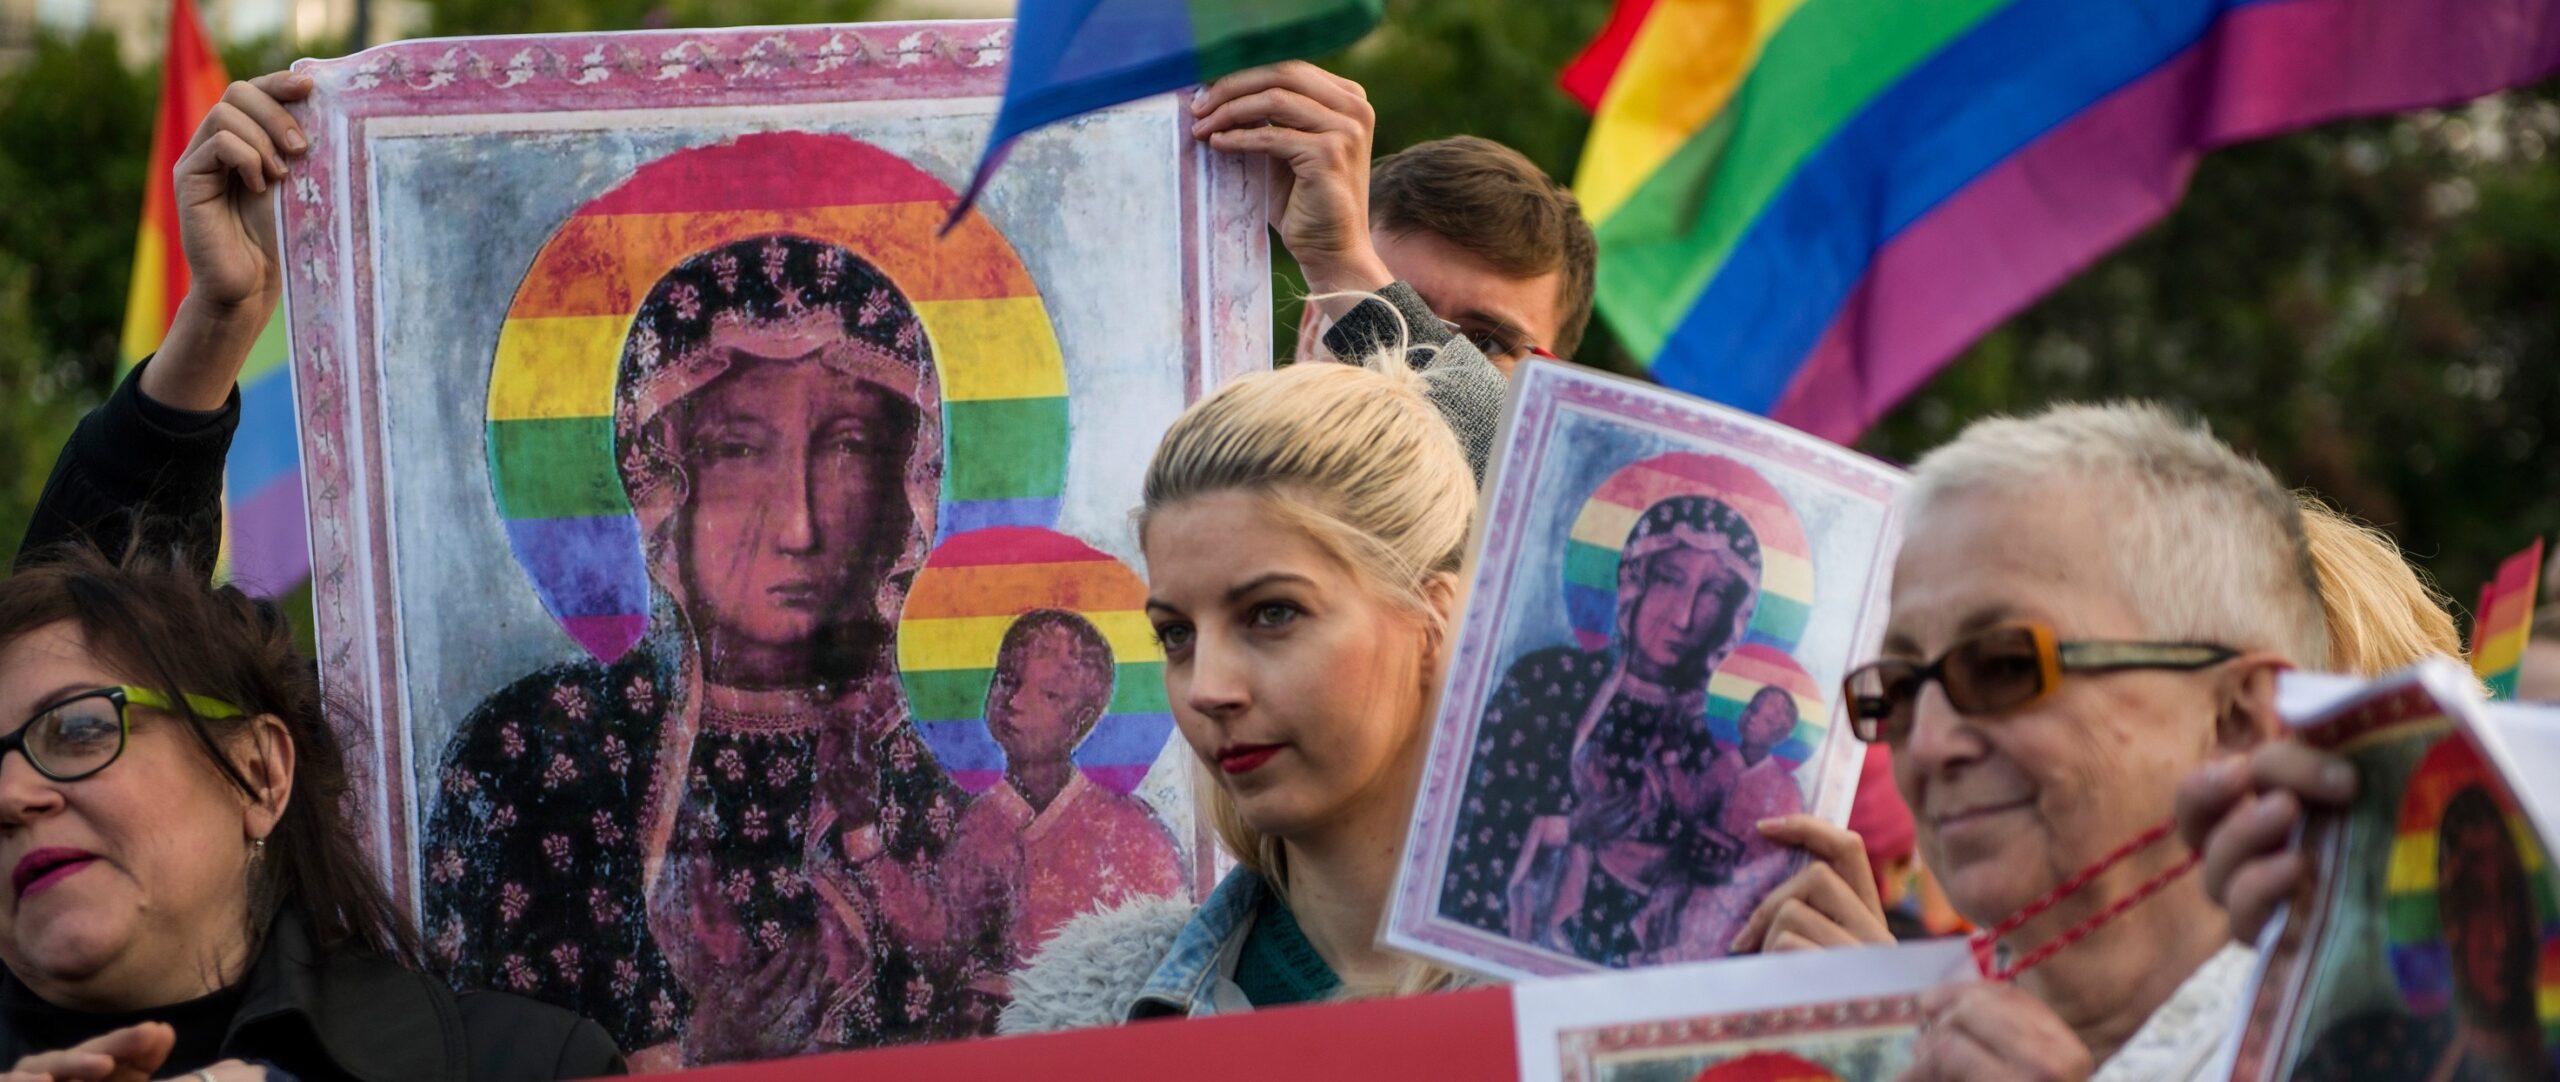 Poland: Drop the charges against Elżbieta, Anna and Joanna